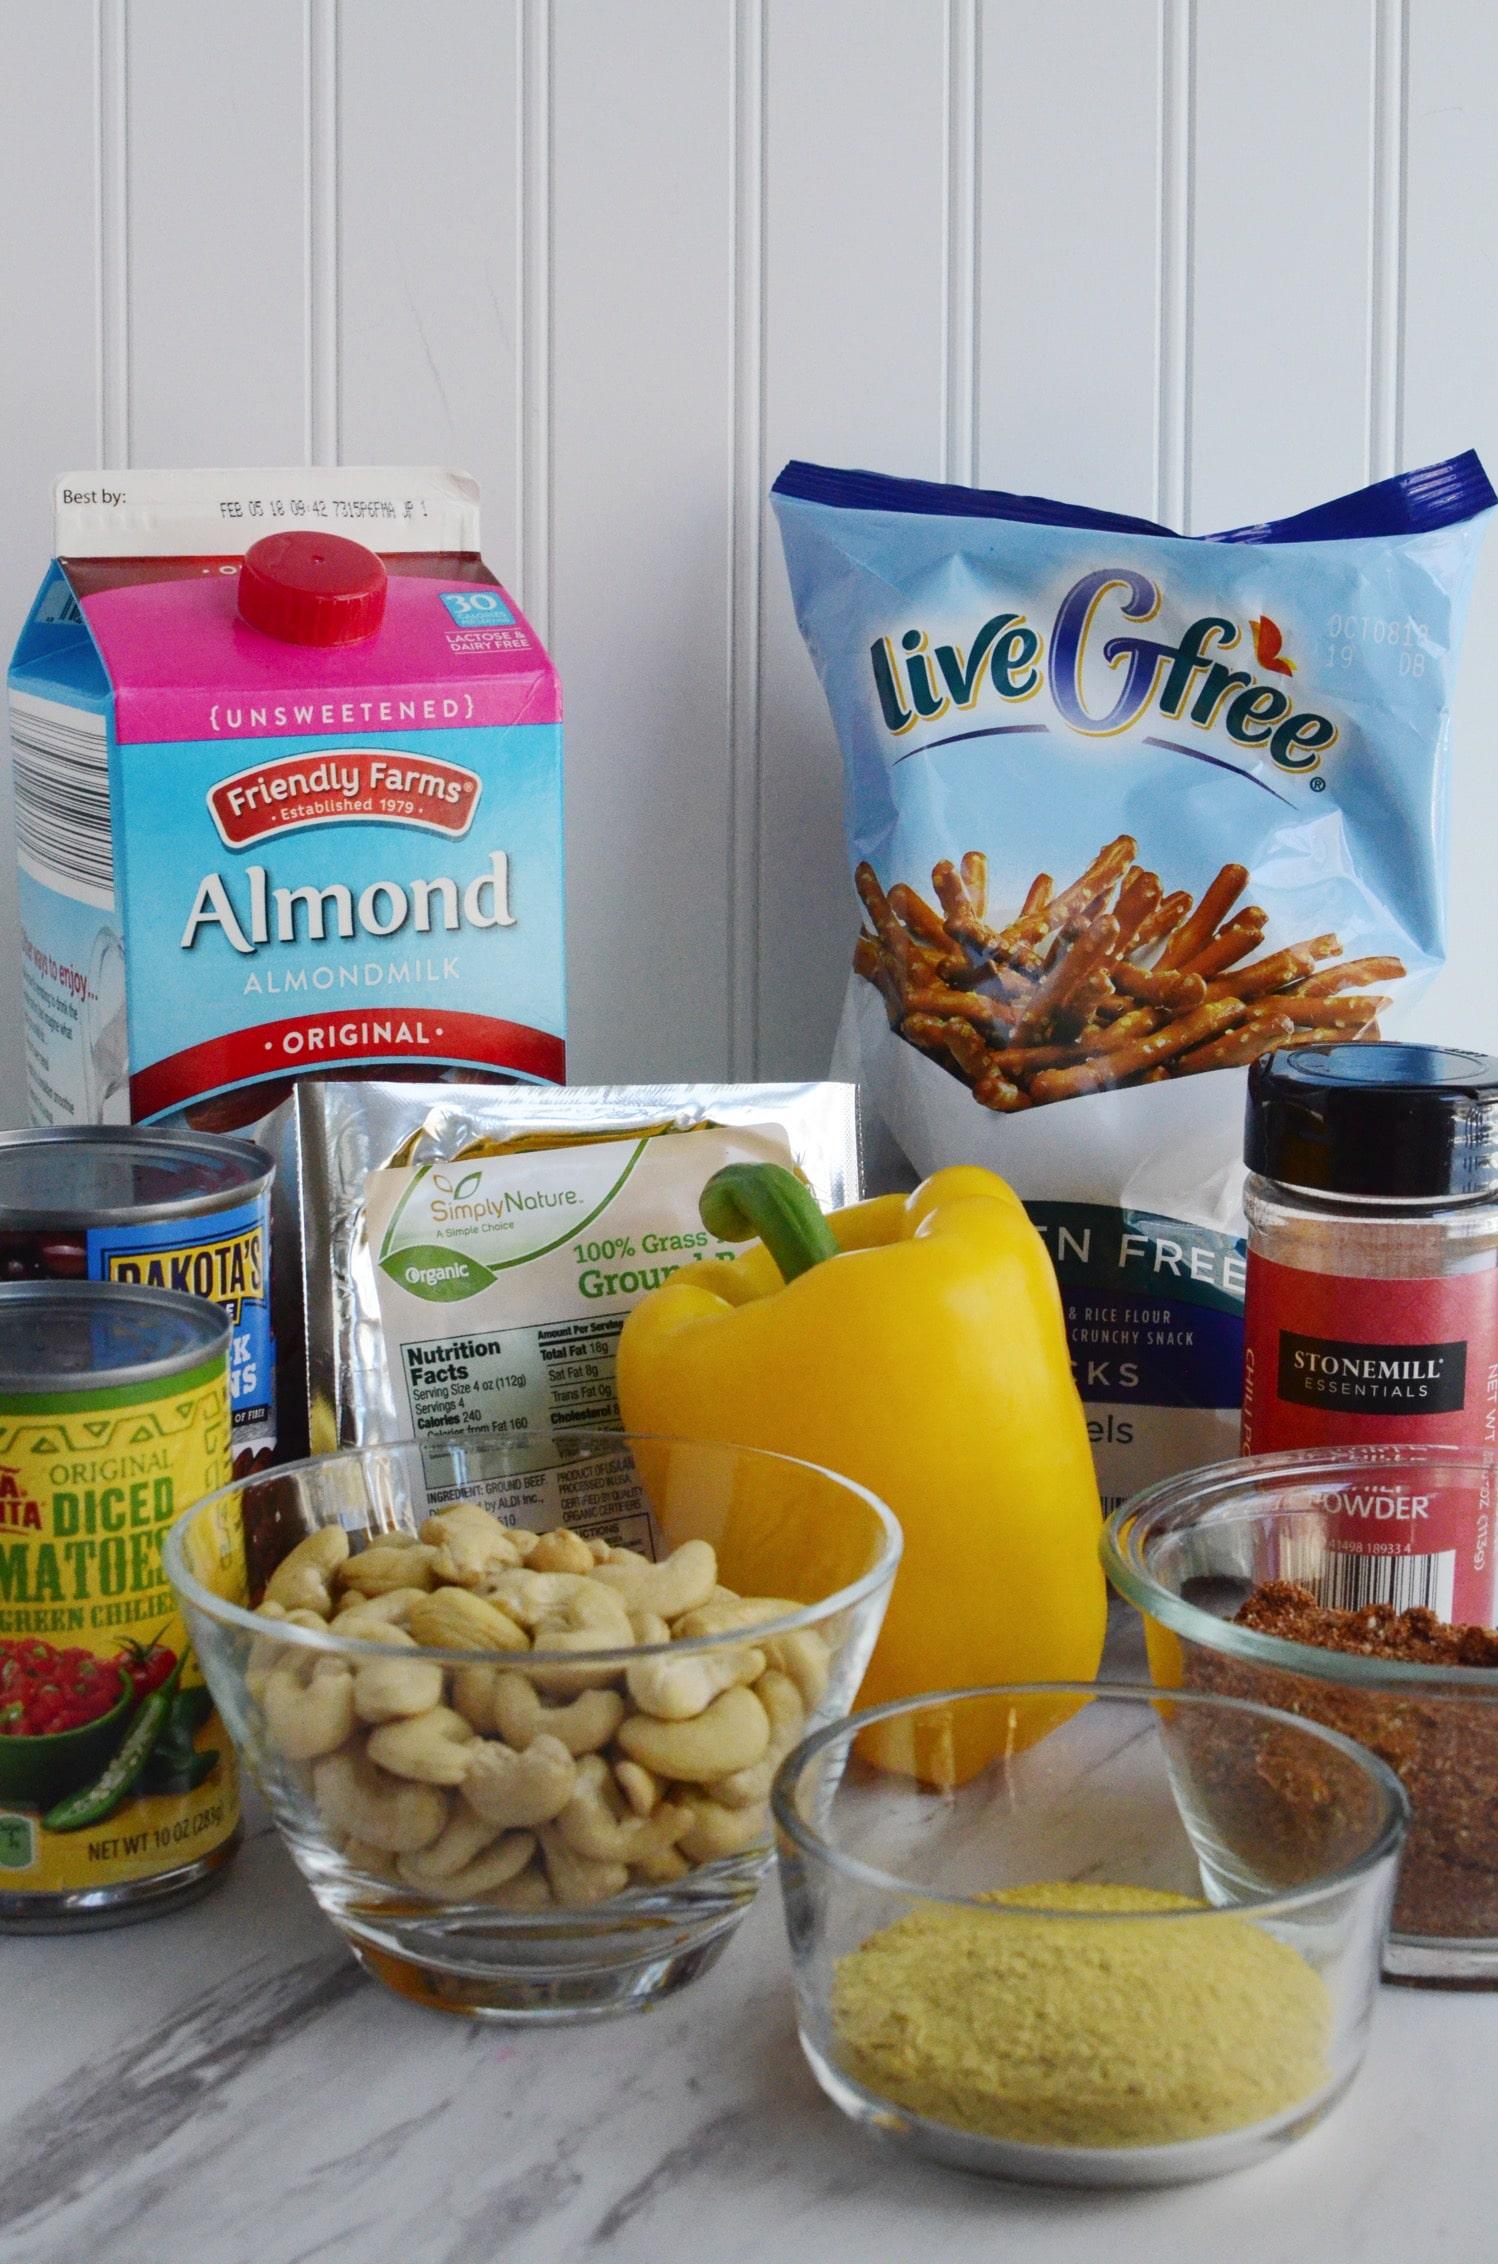 Dairy free chili cheese dip ingredients